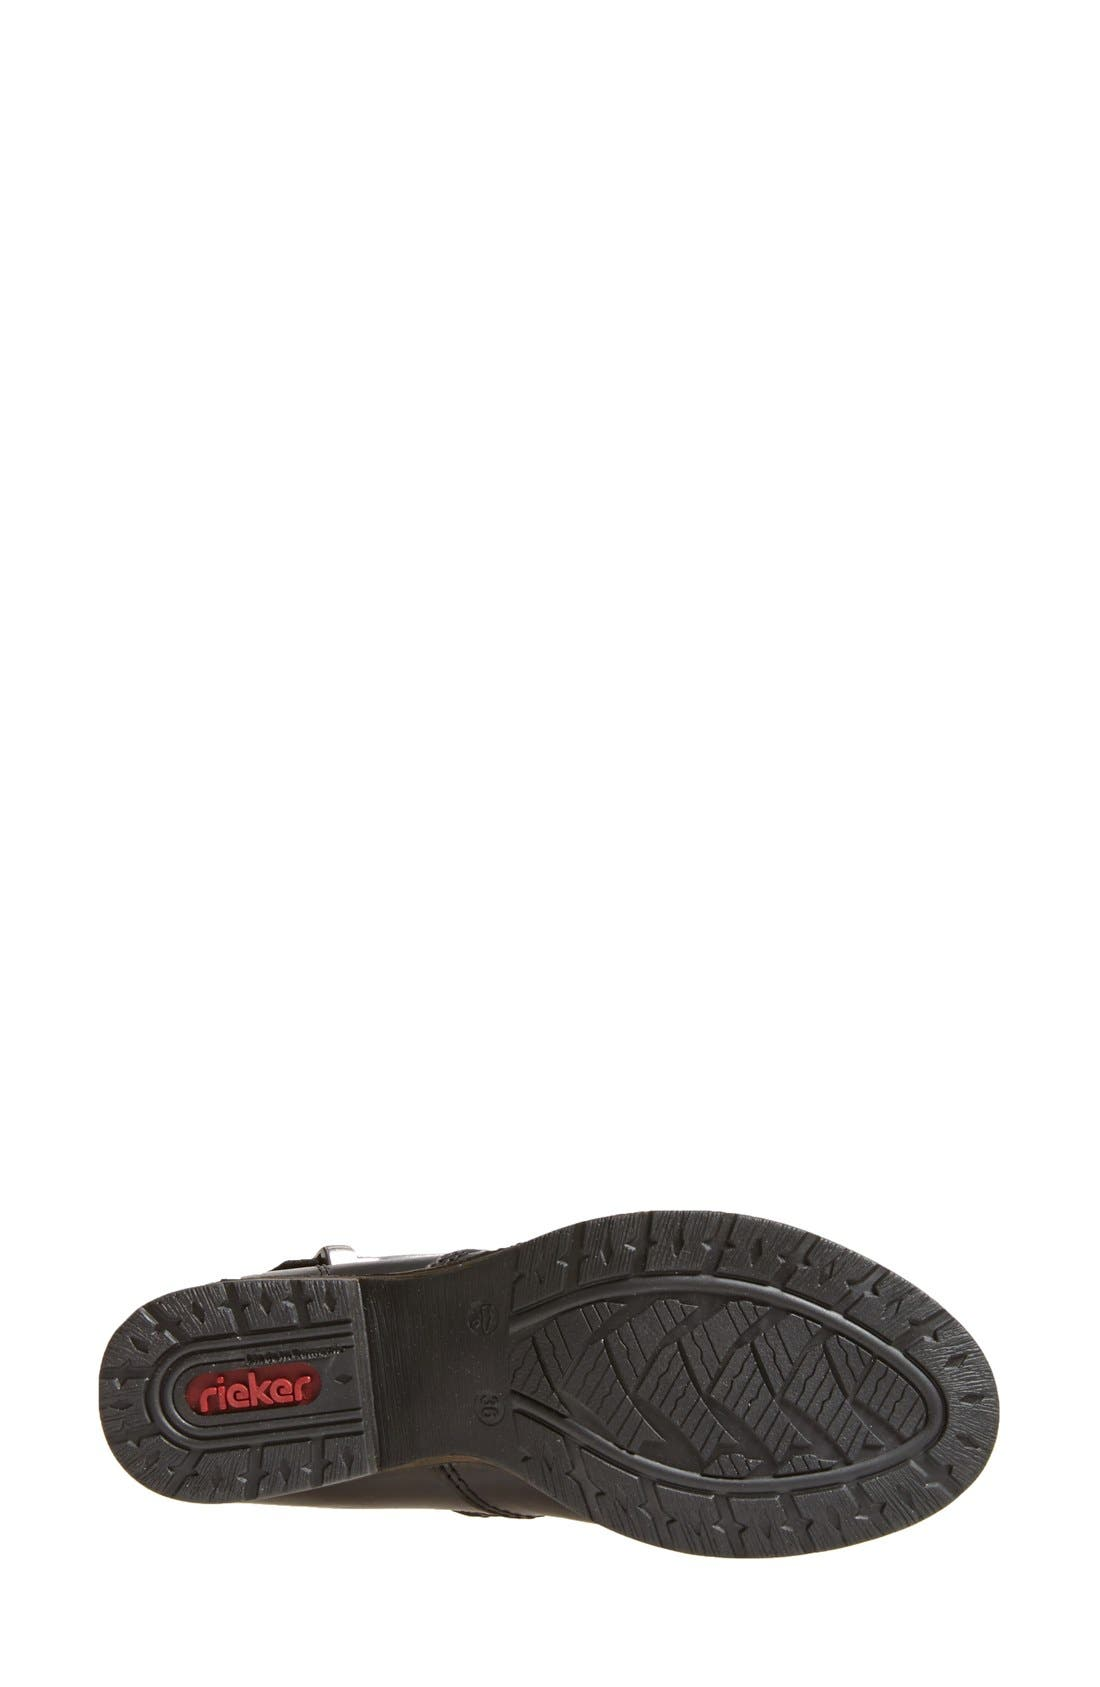 RiekerAntistress 'Faith 80' Tall Boot,                             Alternate thumbnail 4, color,                             Black Leather